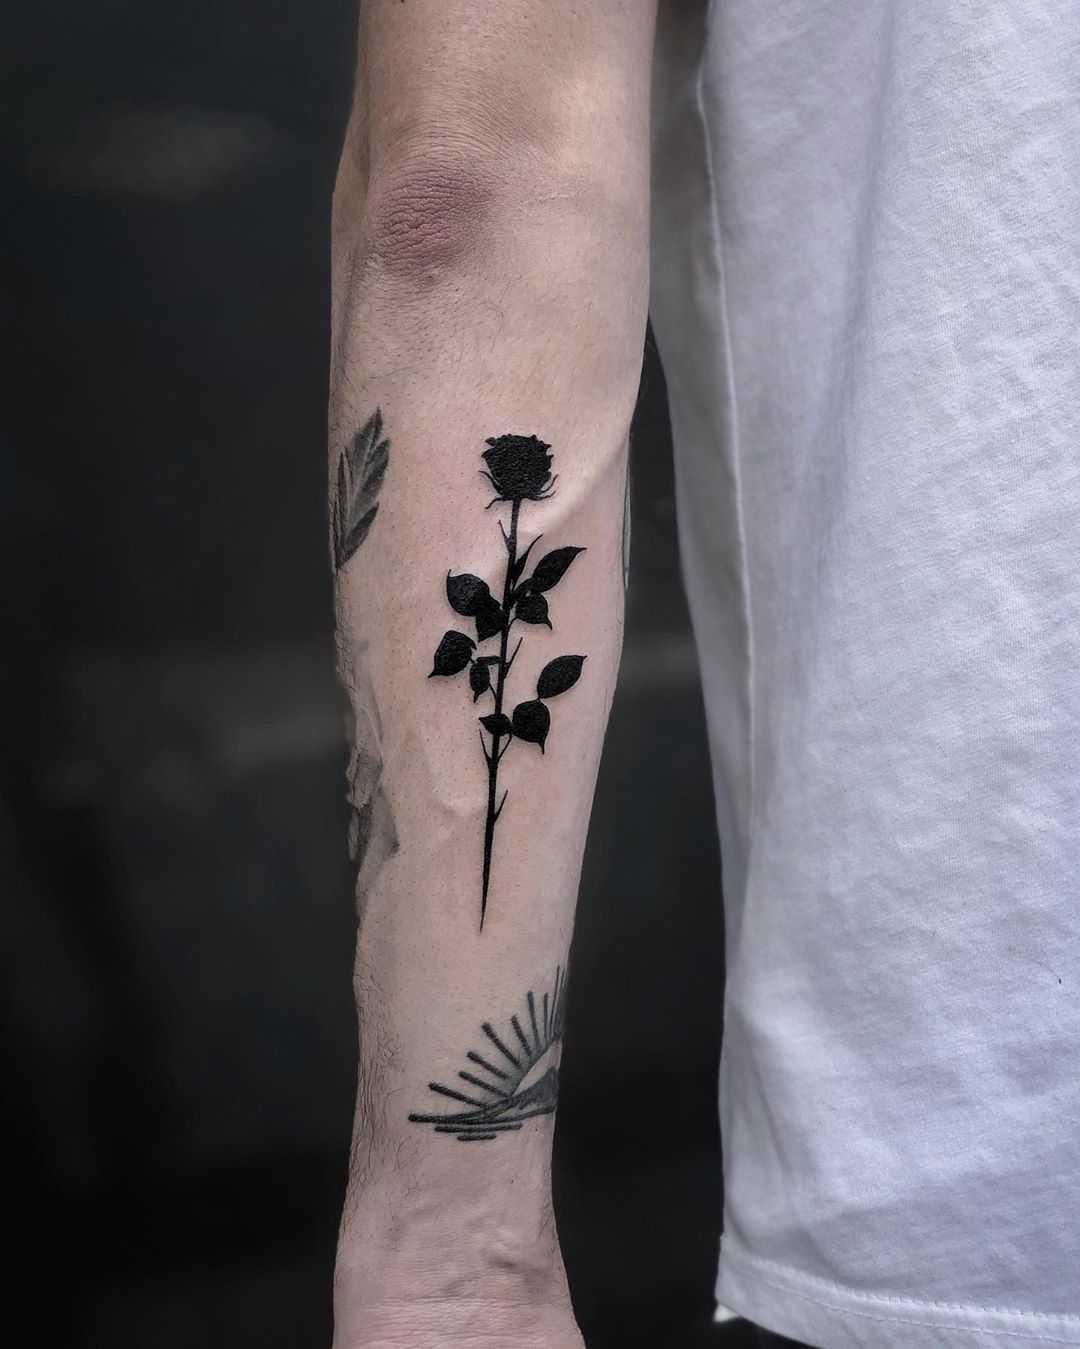 Solid black rose tattoo by Loz McLean